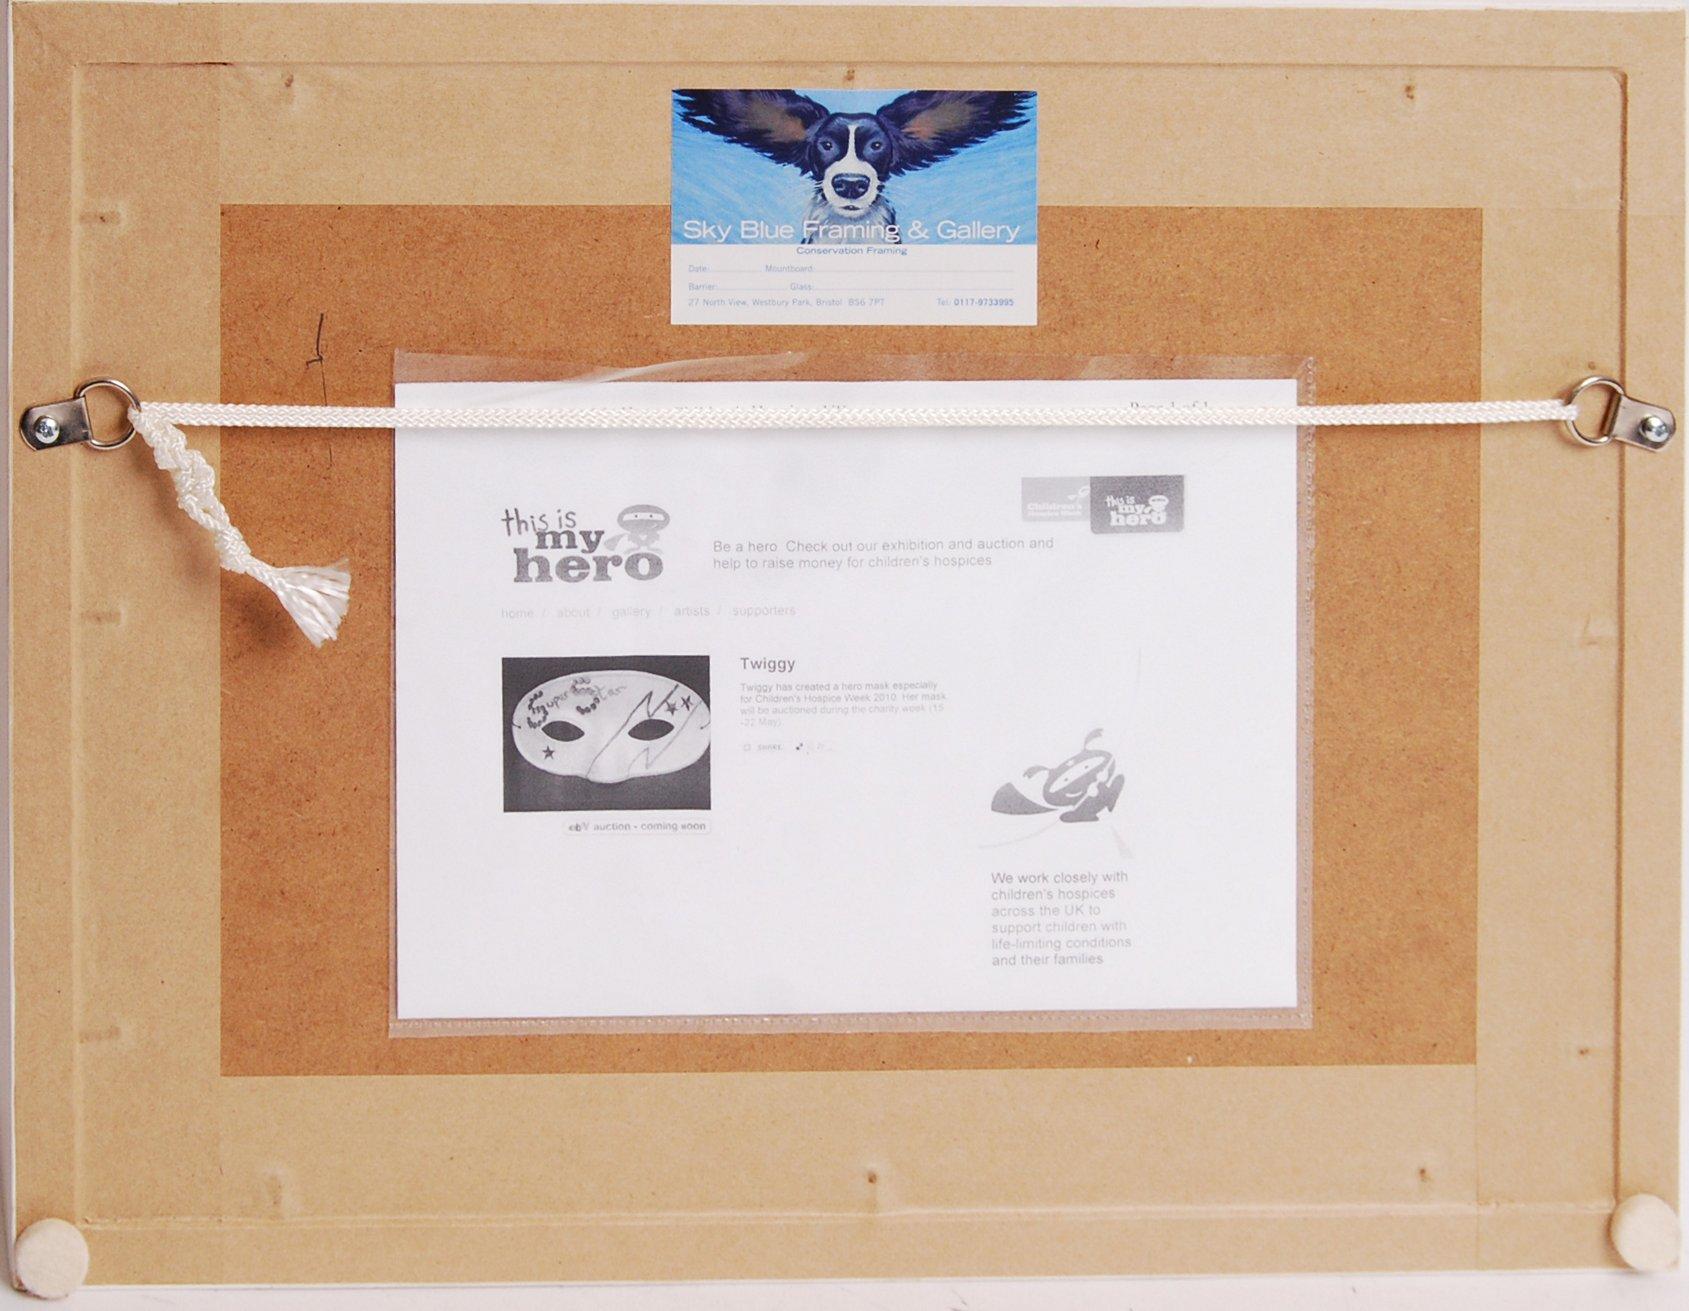 TWIGGY - UNIQUELY CREATED / DESIGNED FACE MASK WIT - Image 4 of 4